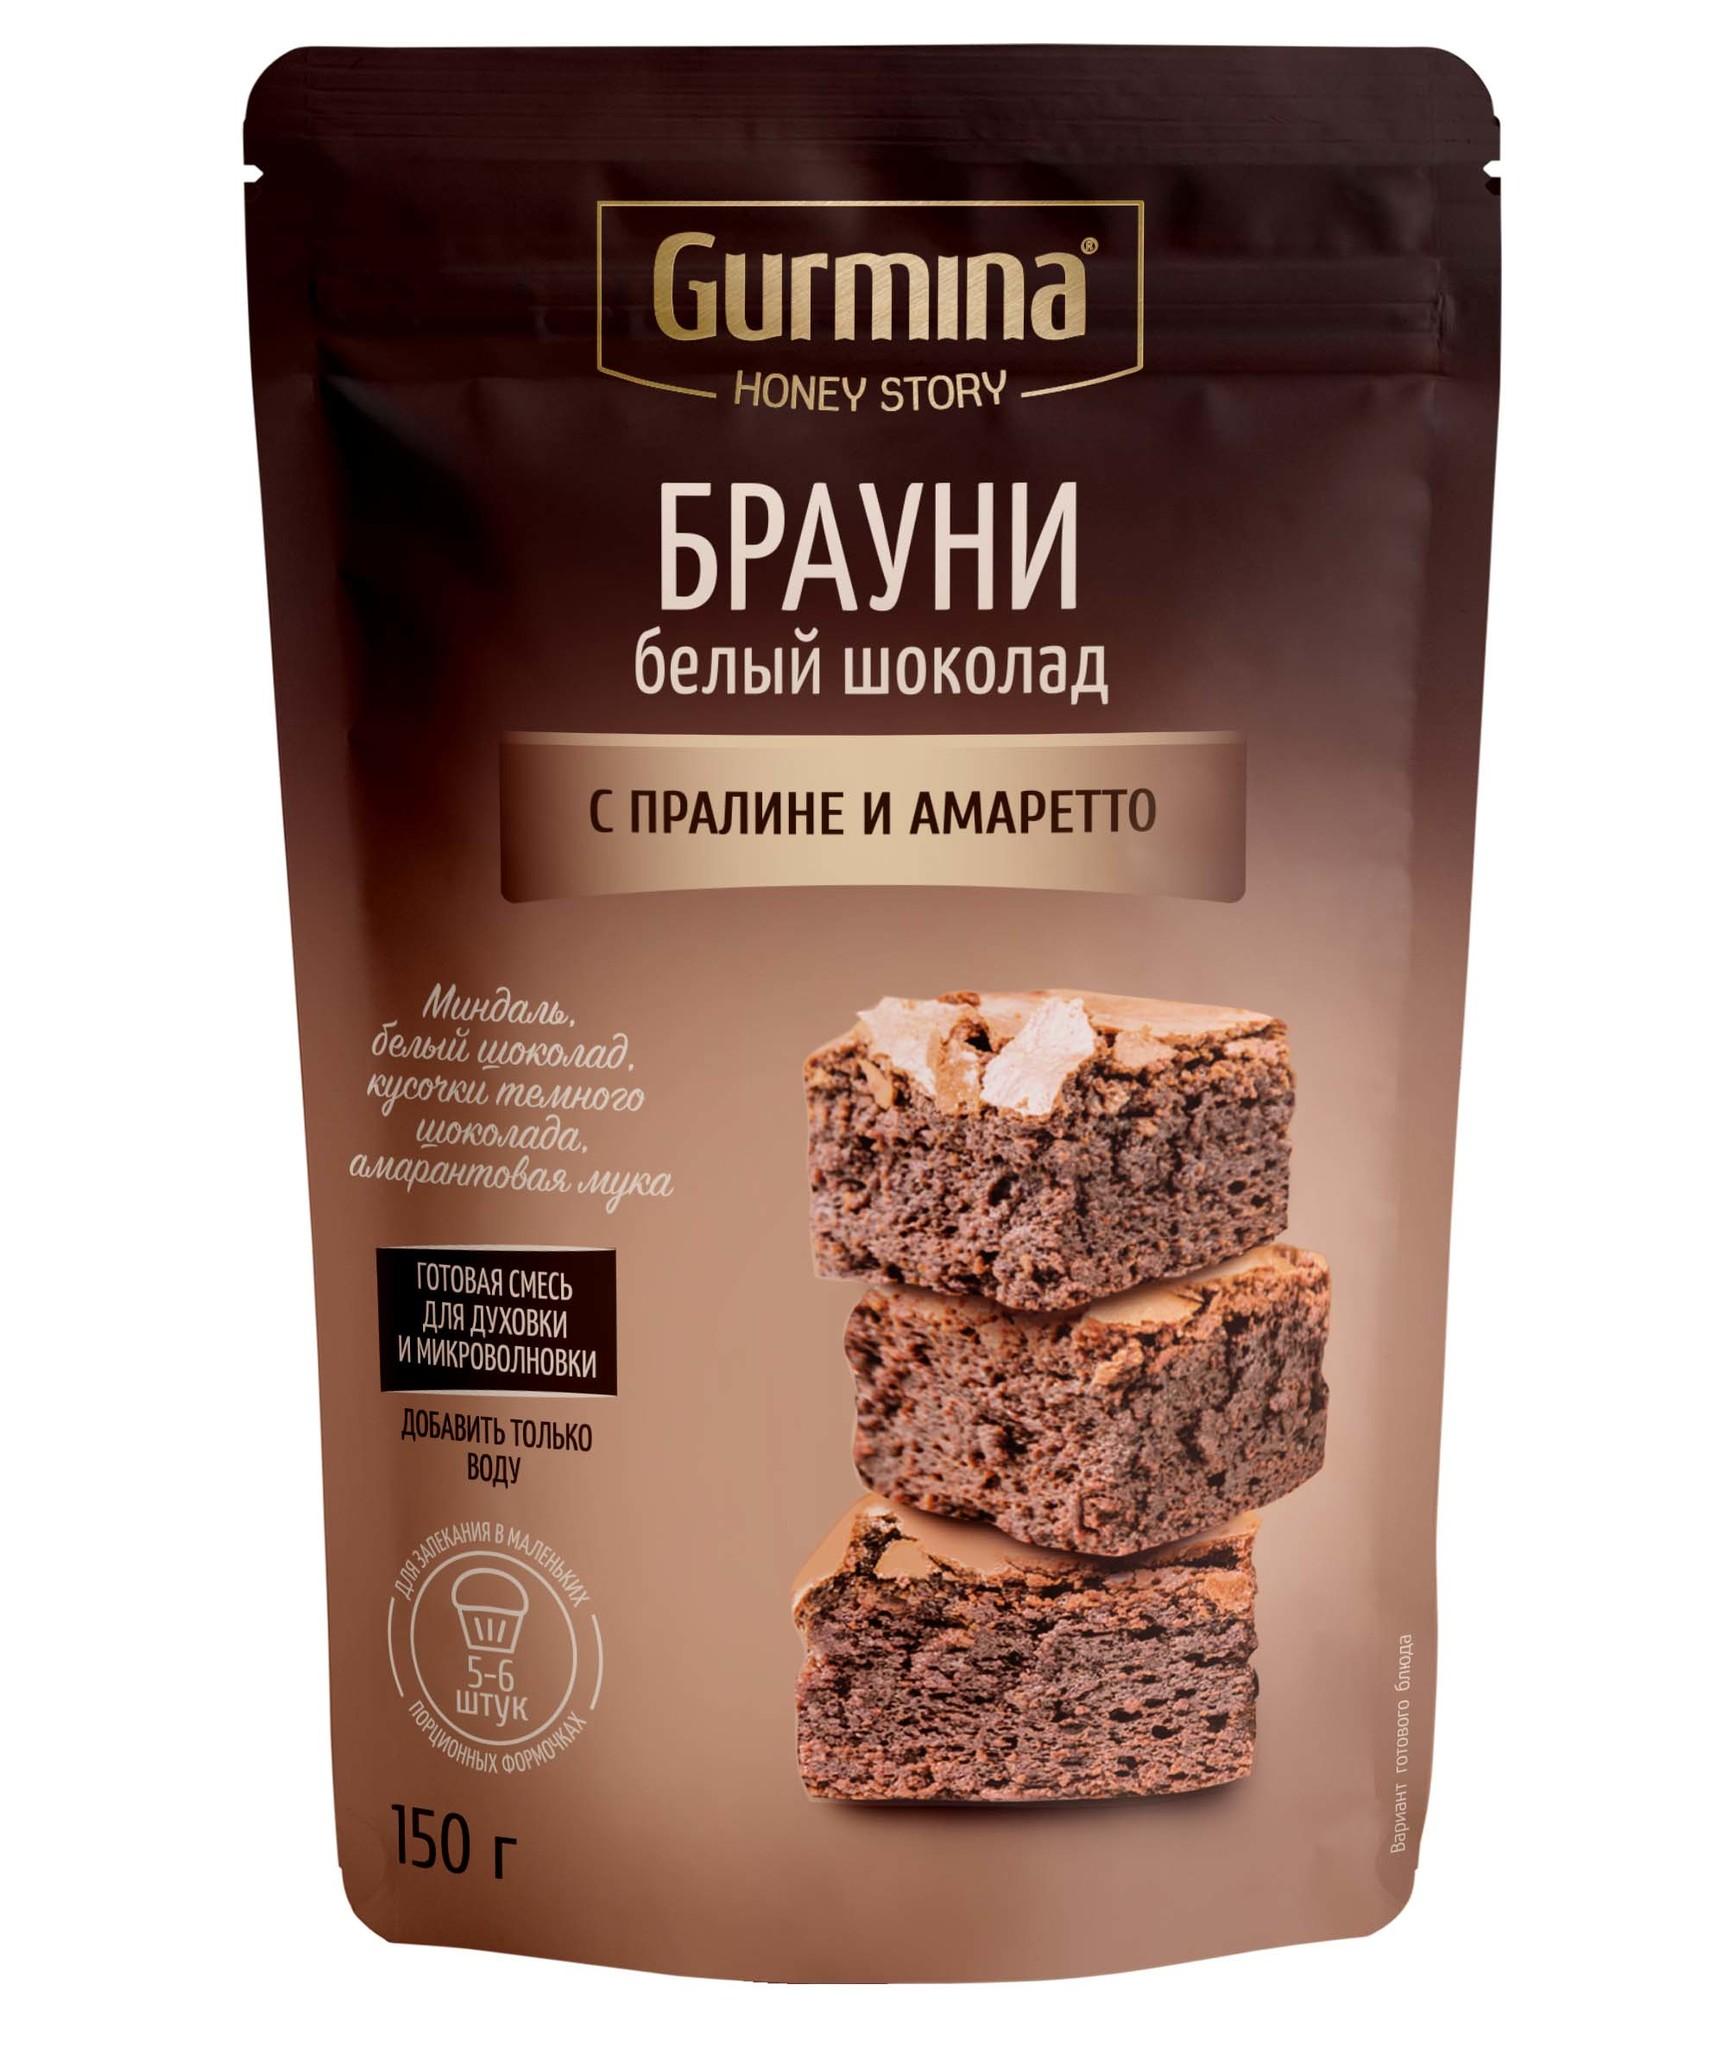 Брауни белый шоколад с пралине и амаретто, 150г.